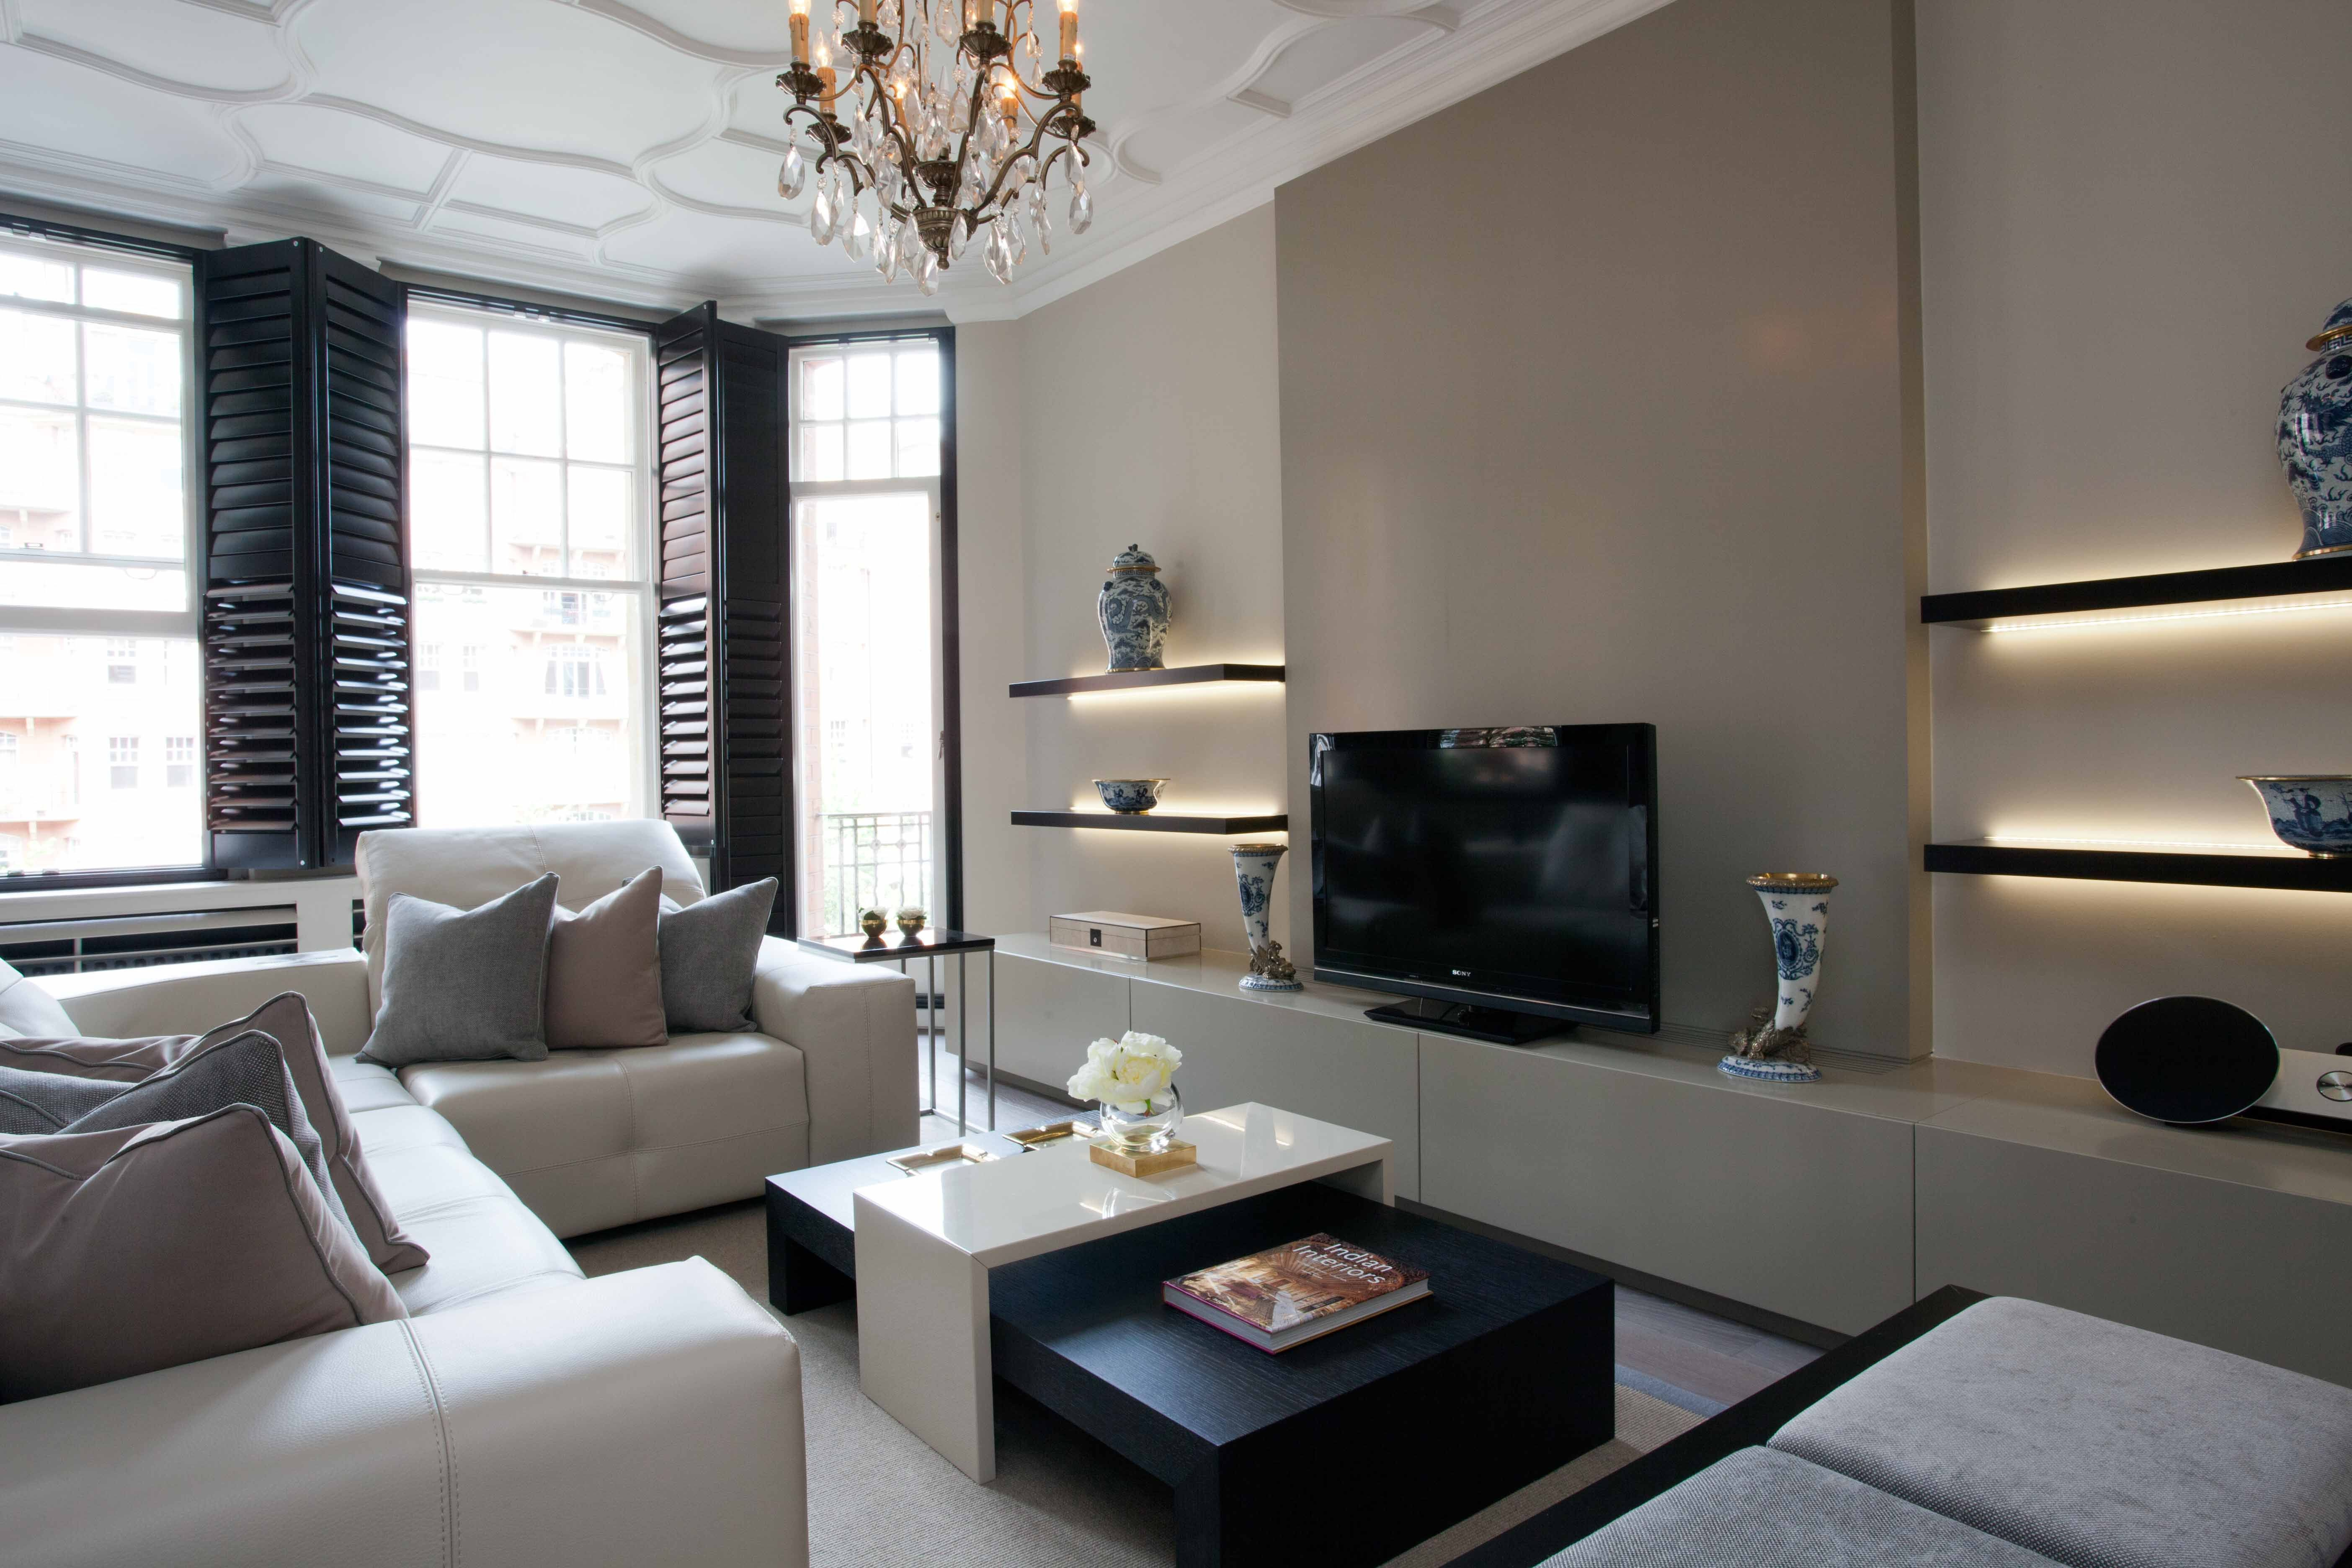 The Studio Harrods Holland Park Luxury Apartment Interior Design Innovation